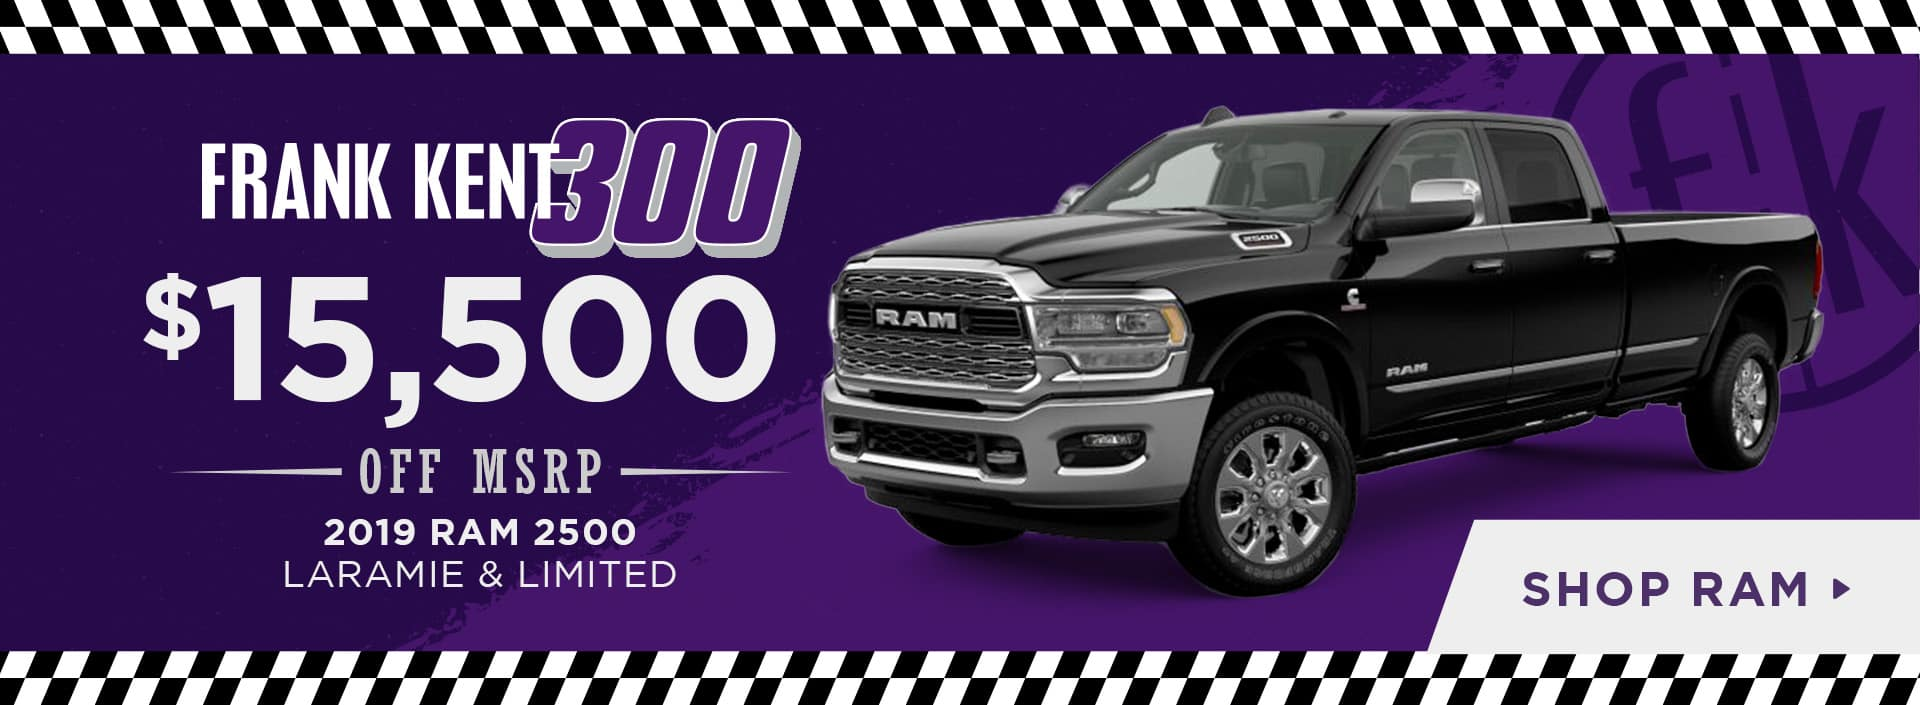 $15,500 OFF 2019 RAM 2500  LARAMIE & LIMITED